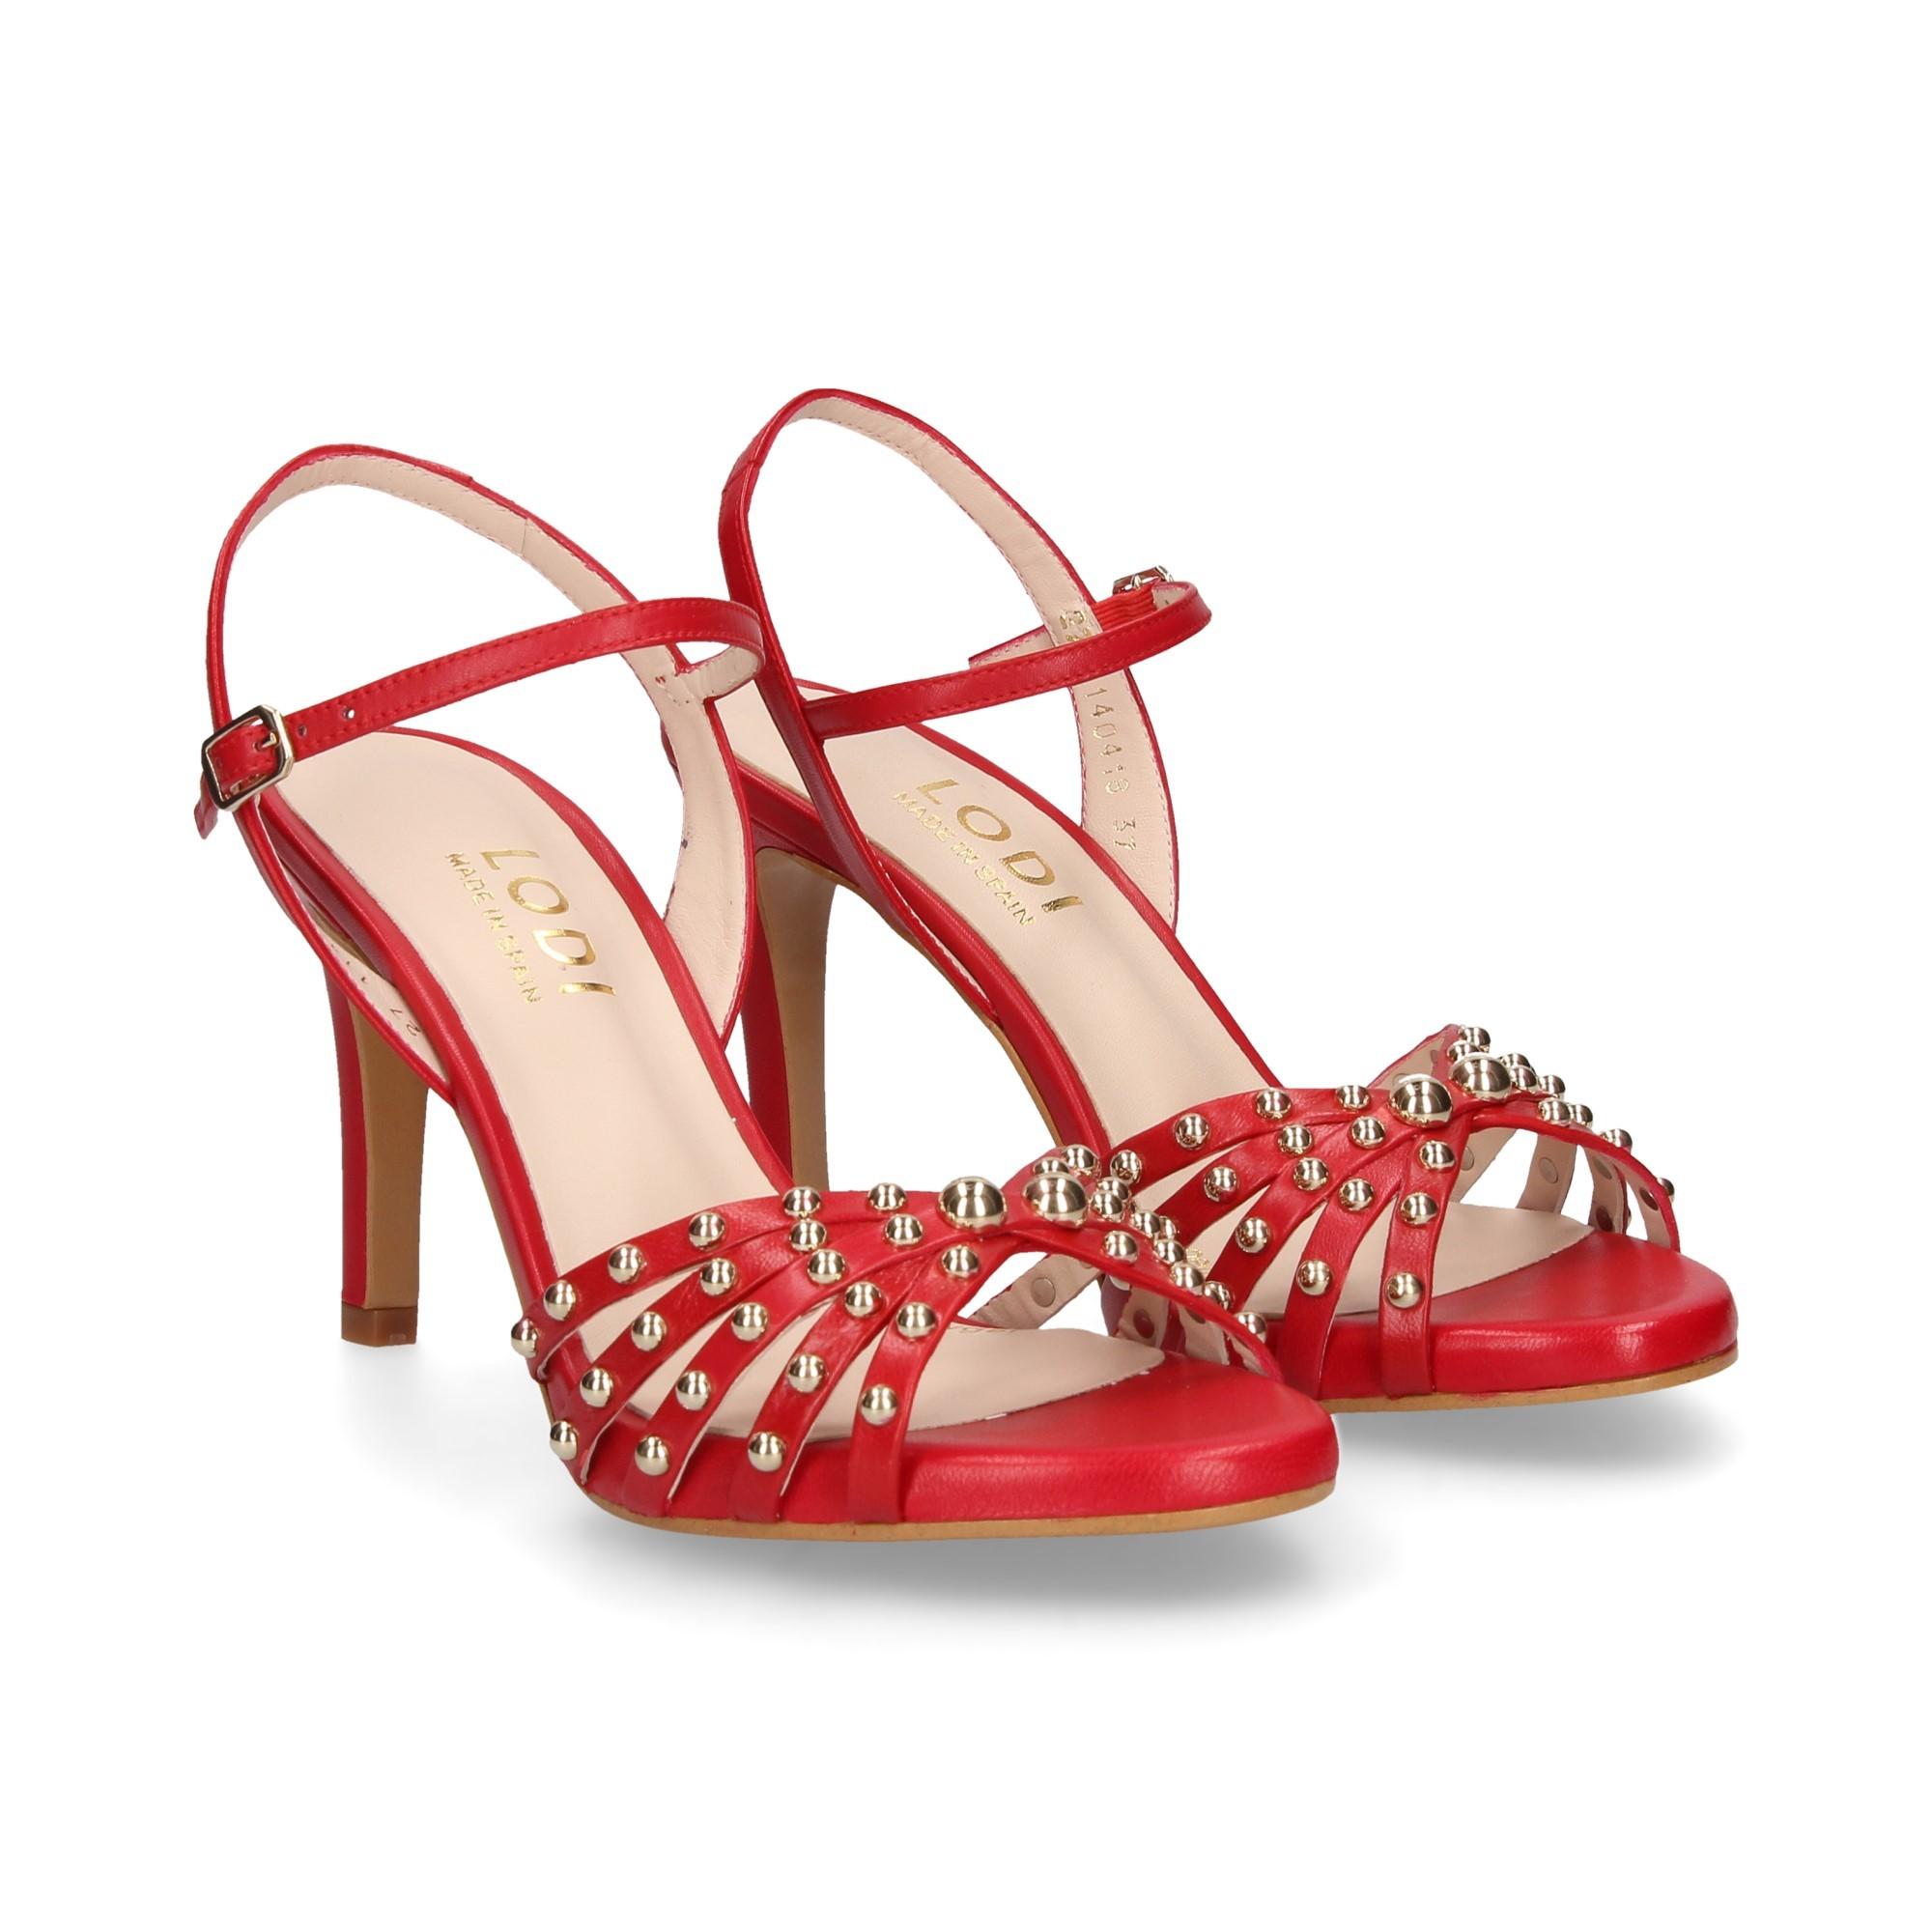 Tacón Rojo Sandalias Ilenia Con De Mujer Lodi DIbH29WEYe